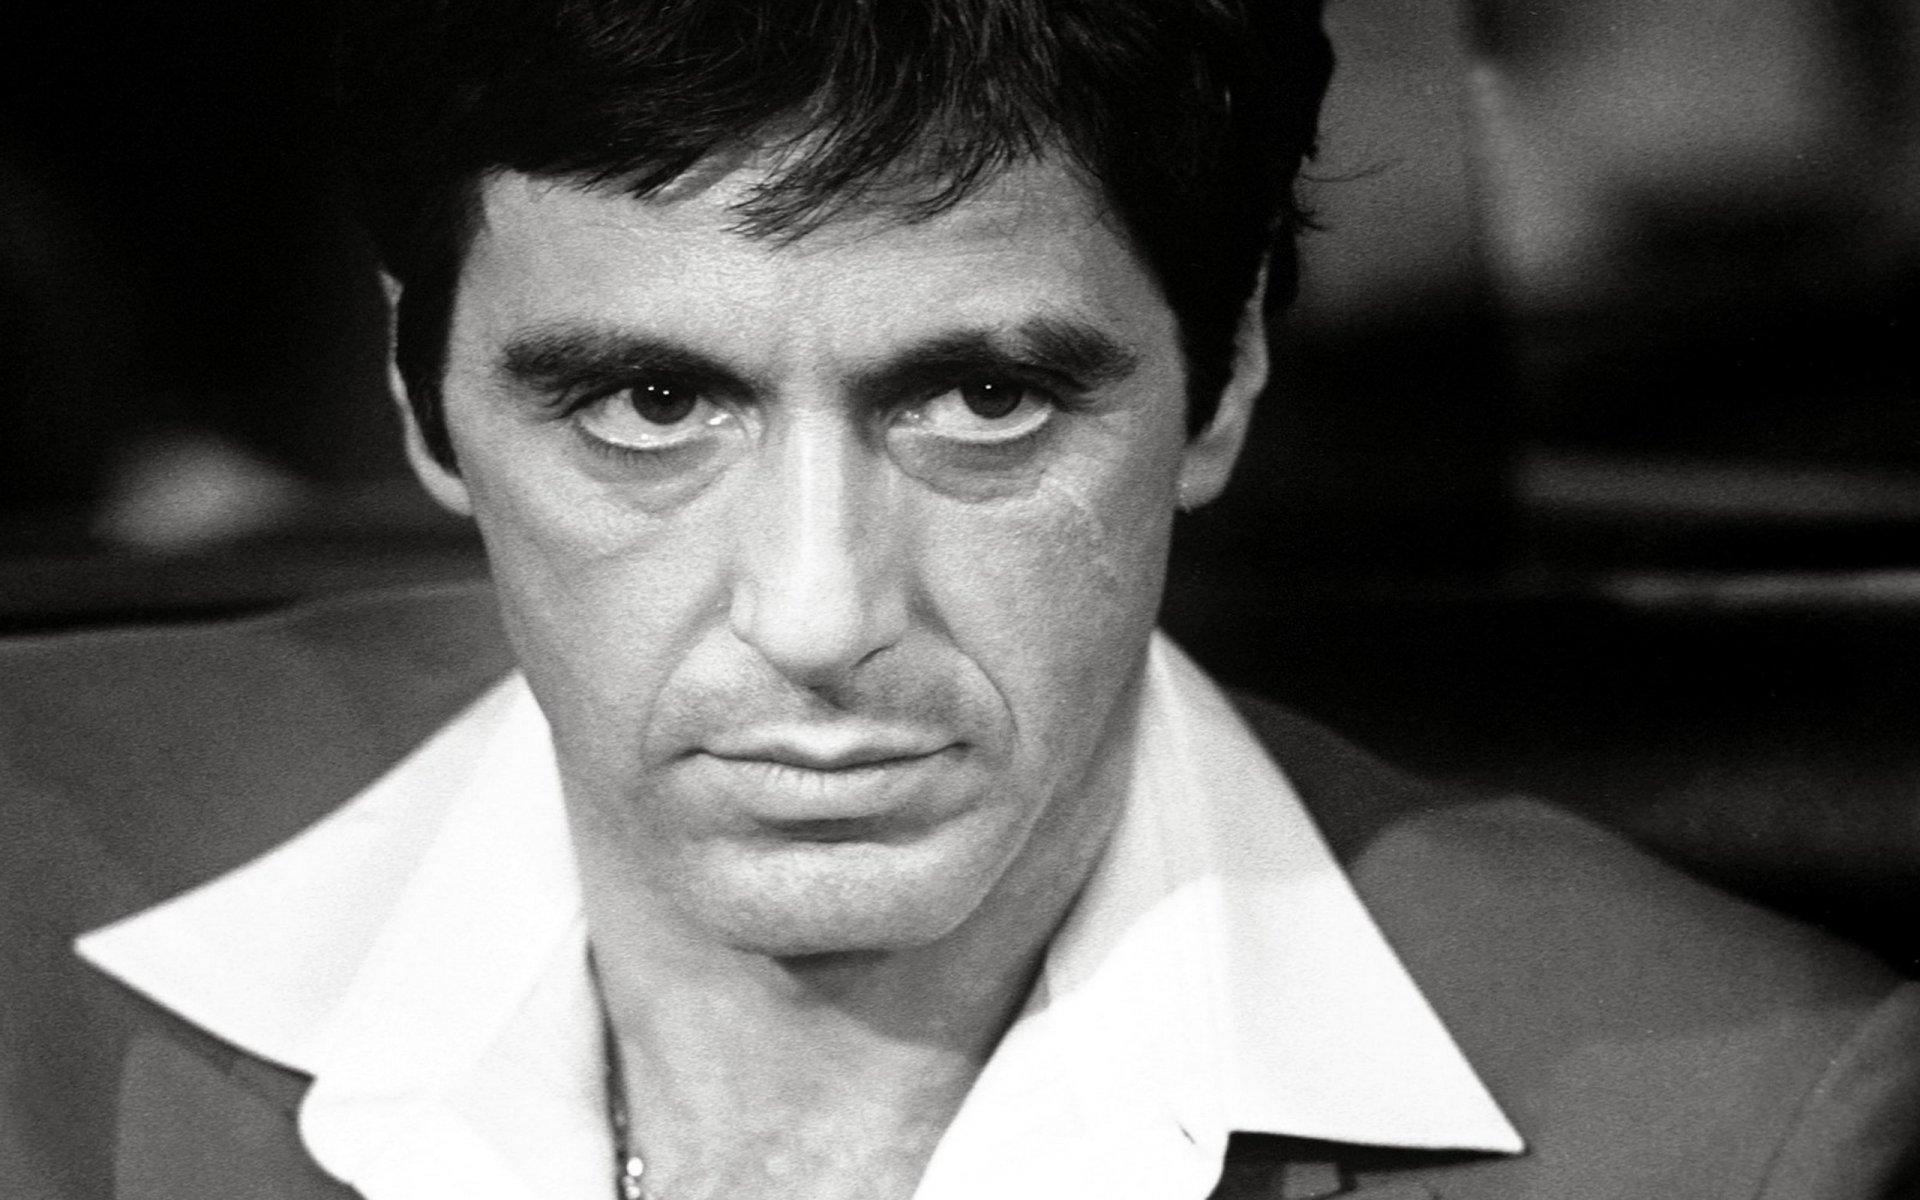 Аль Пачино актер